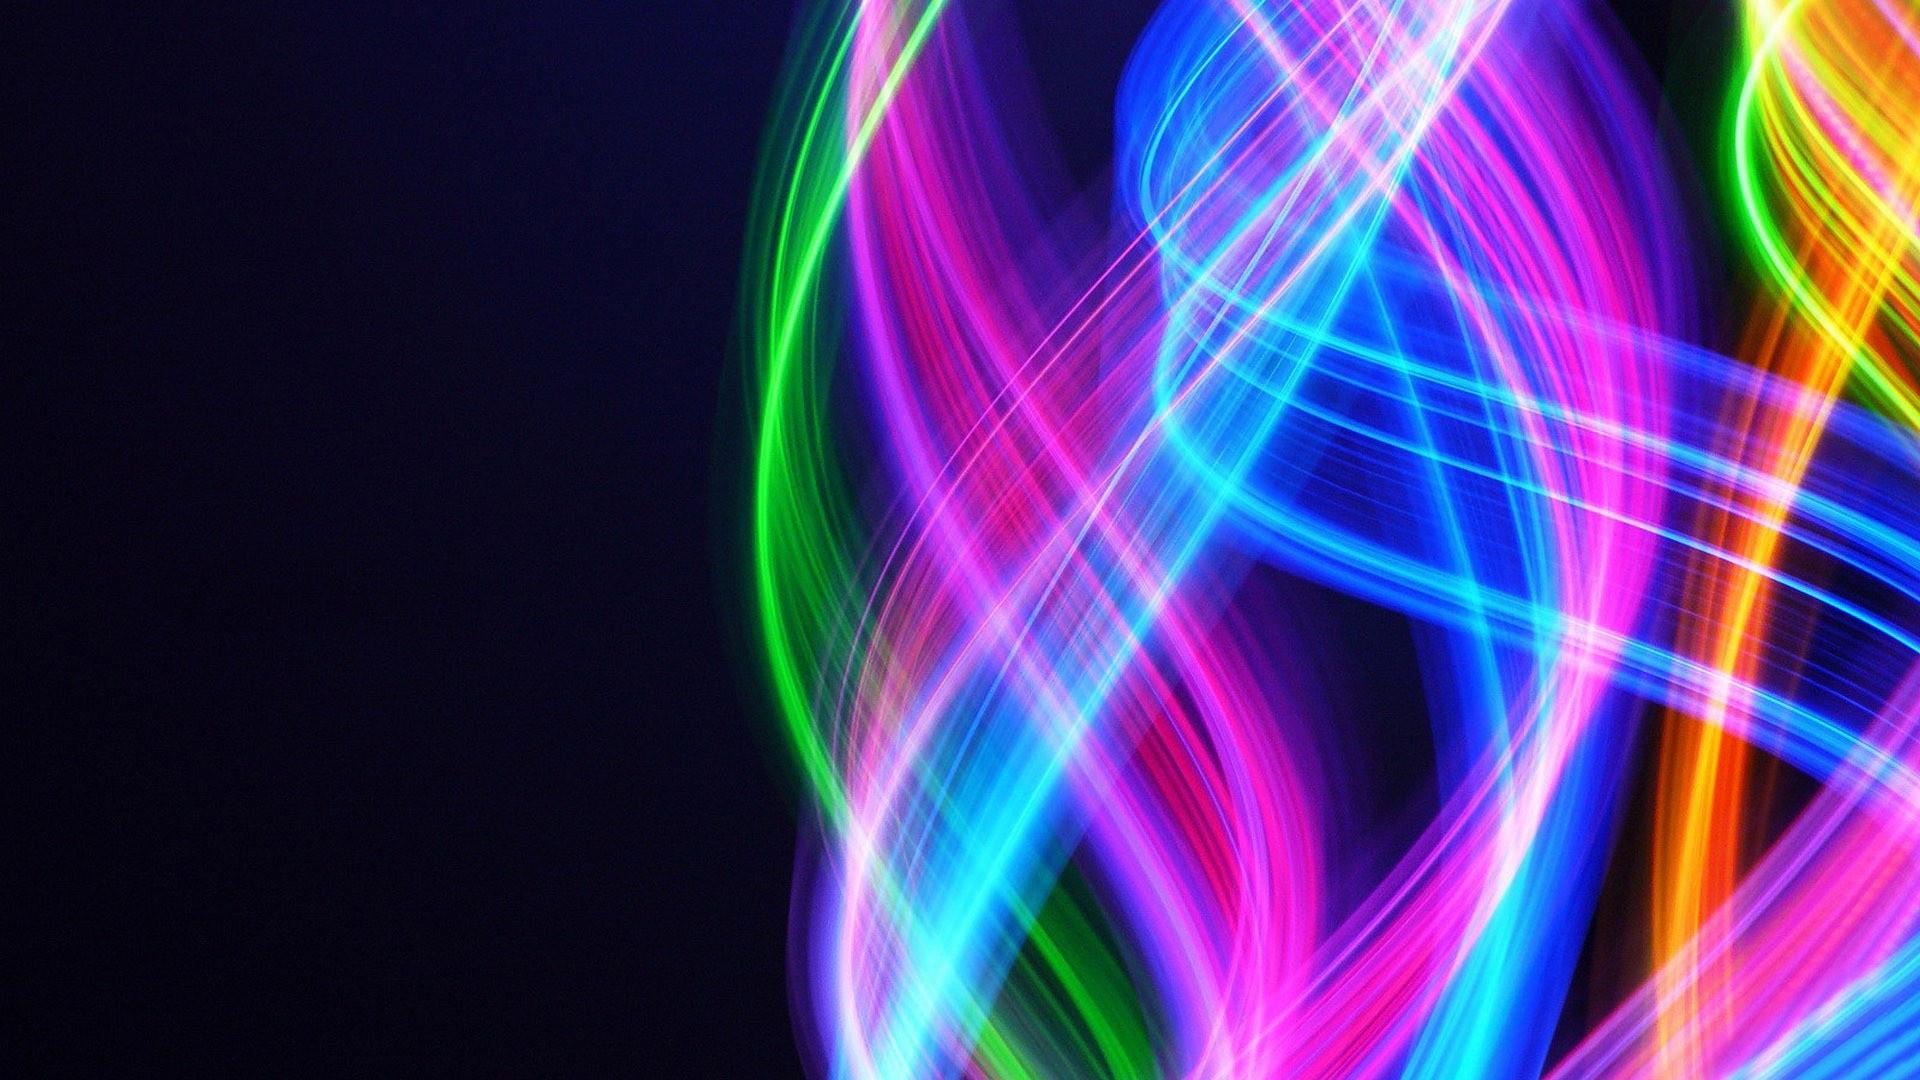 Blue Neon Background wallpaper 157638